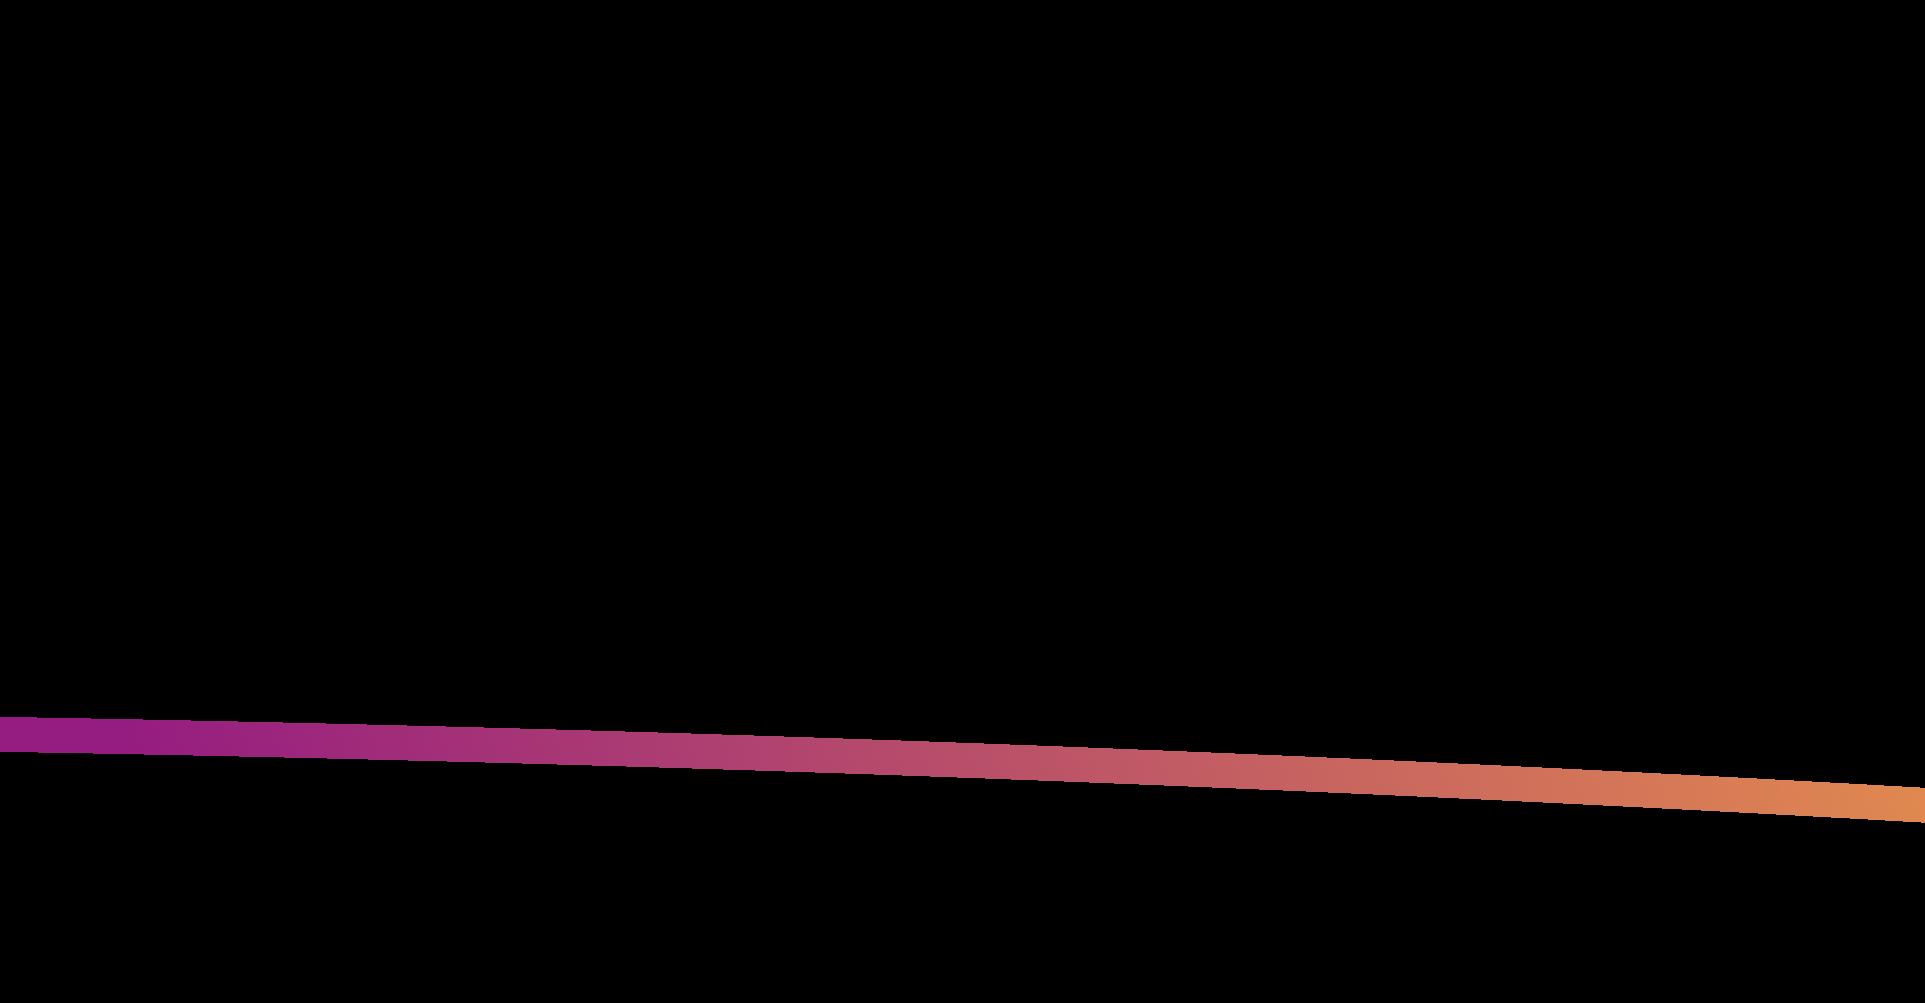 Tangente-Line